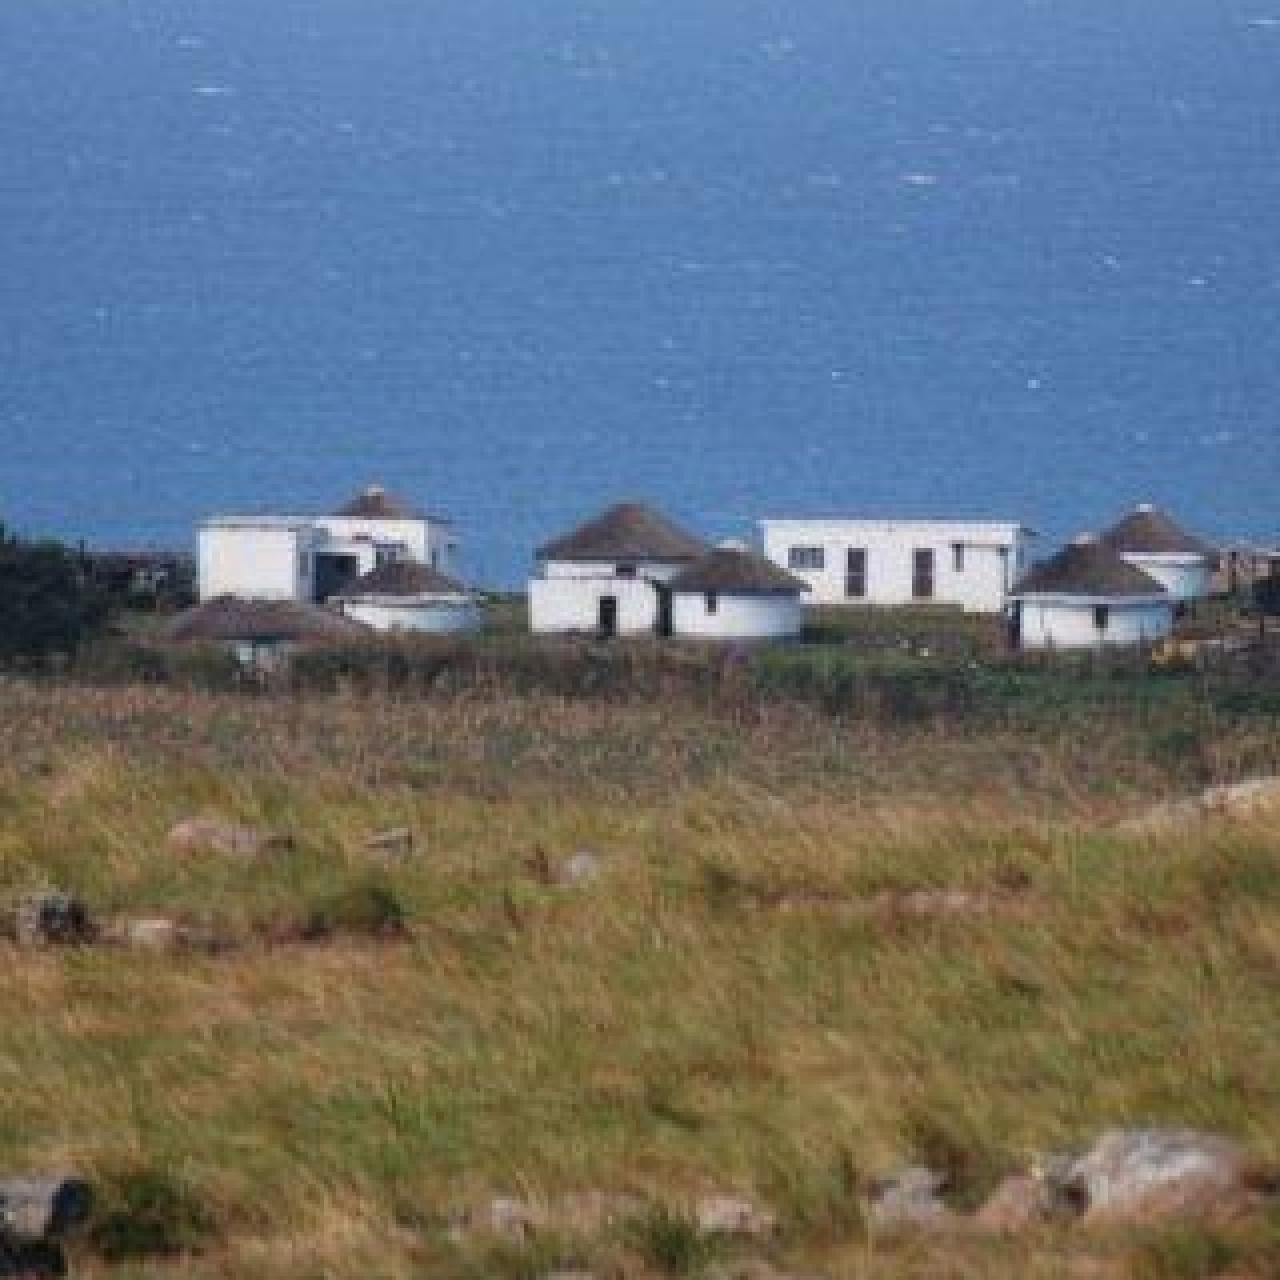 Homesteads in Xolobeni